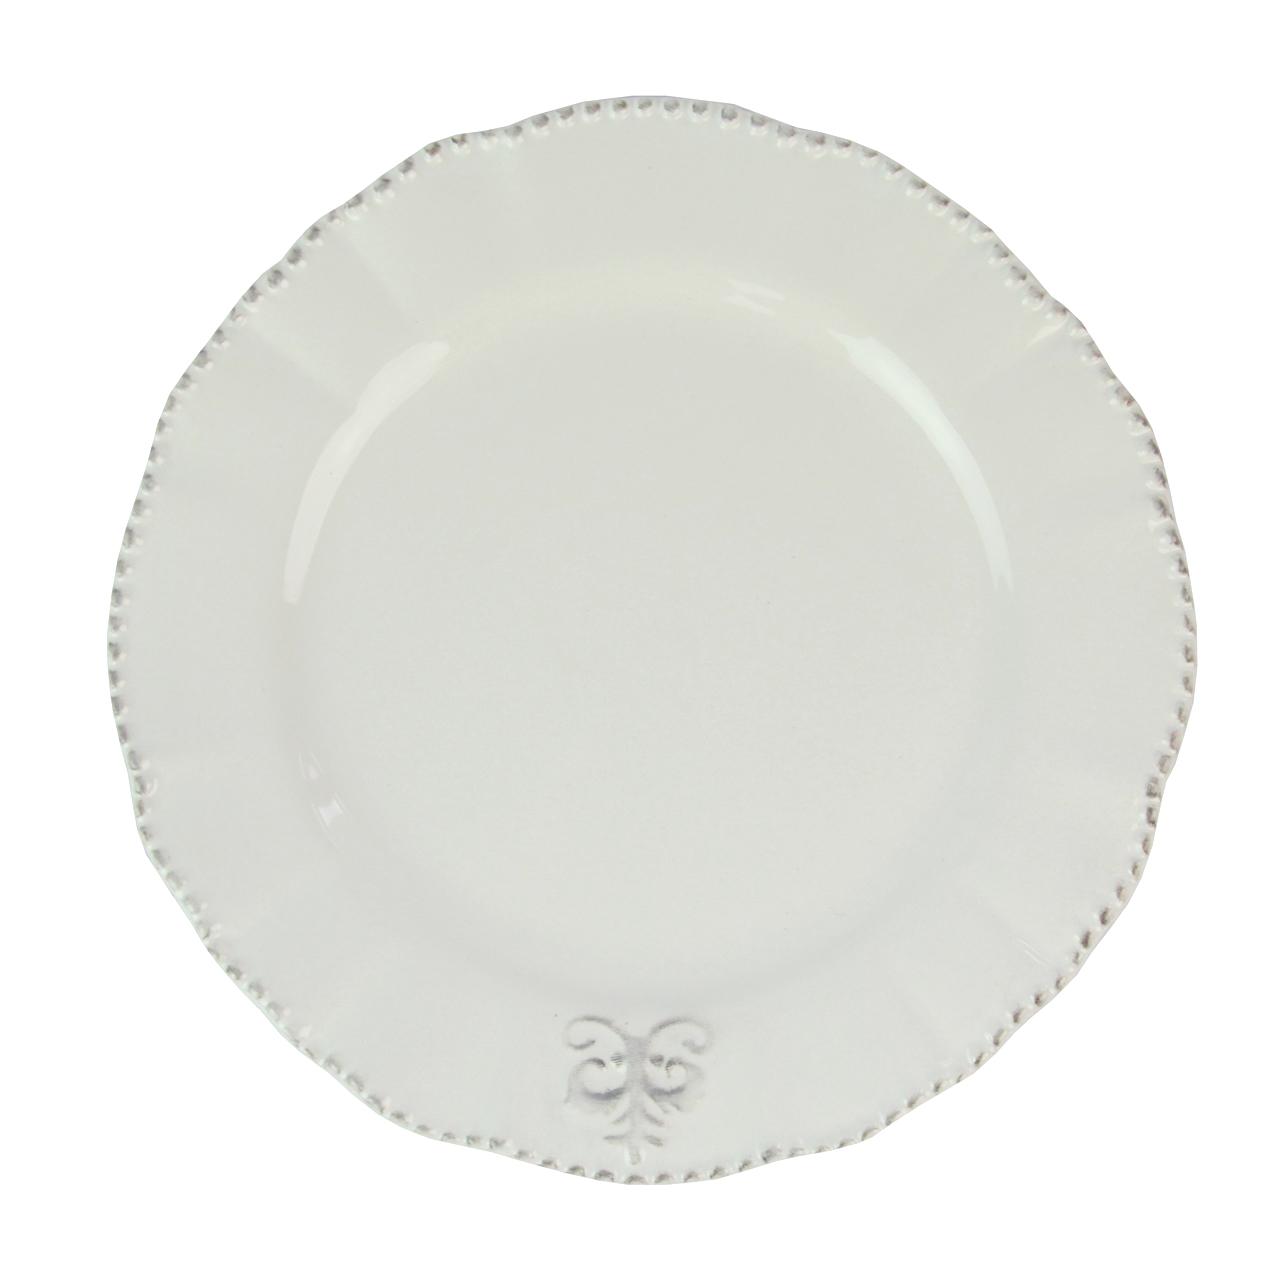 Farfurie Din Ceramica Alba 20 Cm